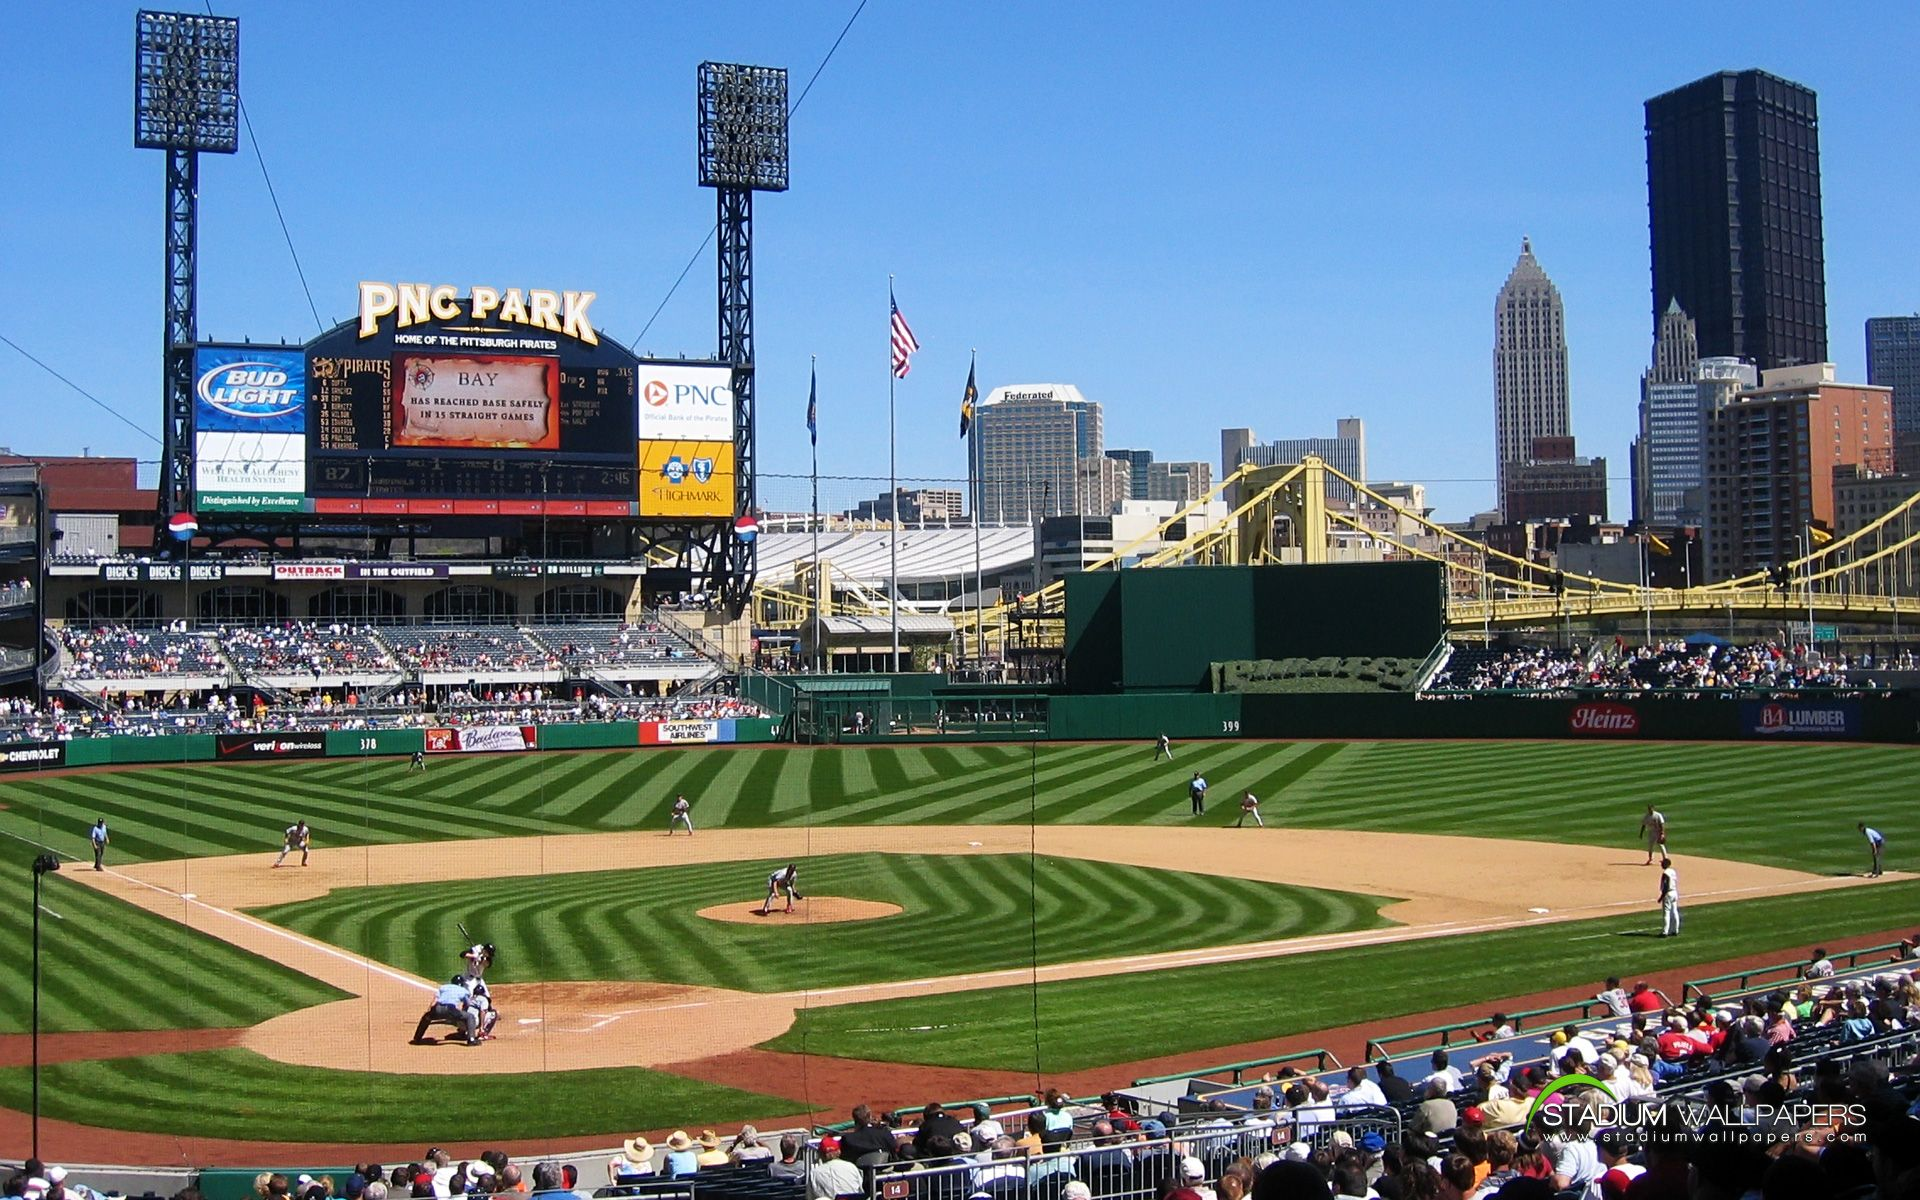 Wallpapers Mlb Baseball Stadium 1920x1200 Baseball Stadium Pnc Park Pittsburgh Pirates Baseball